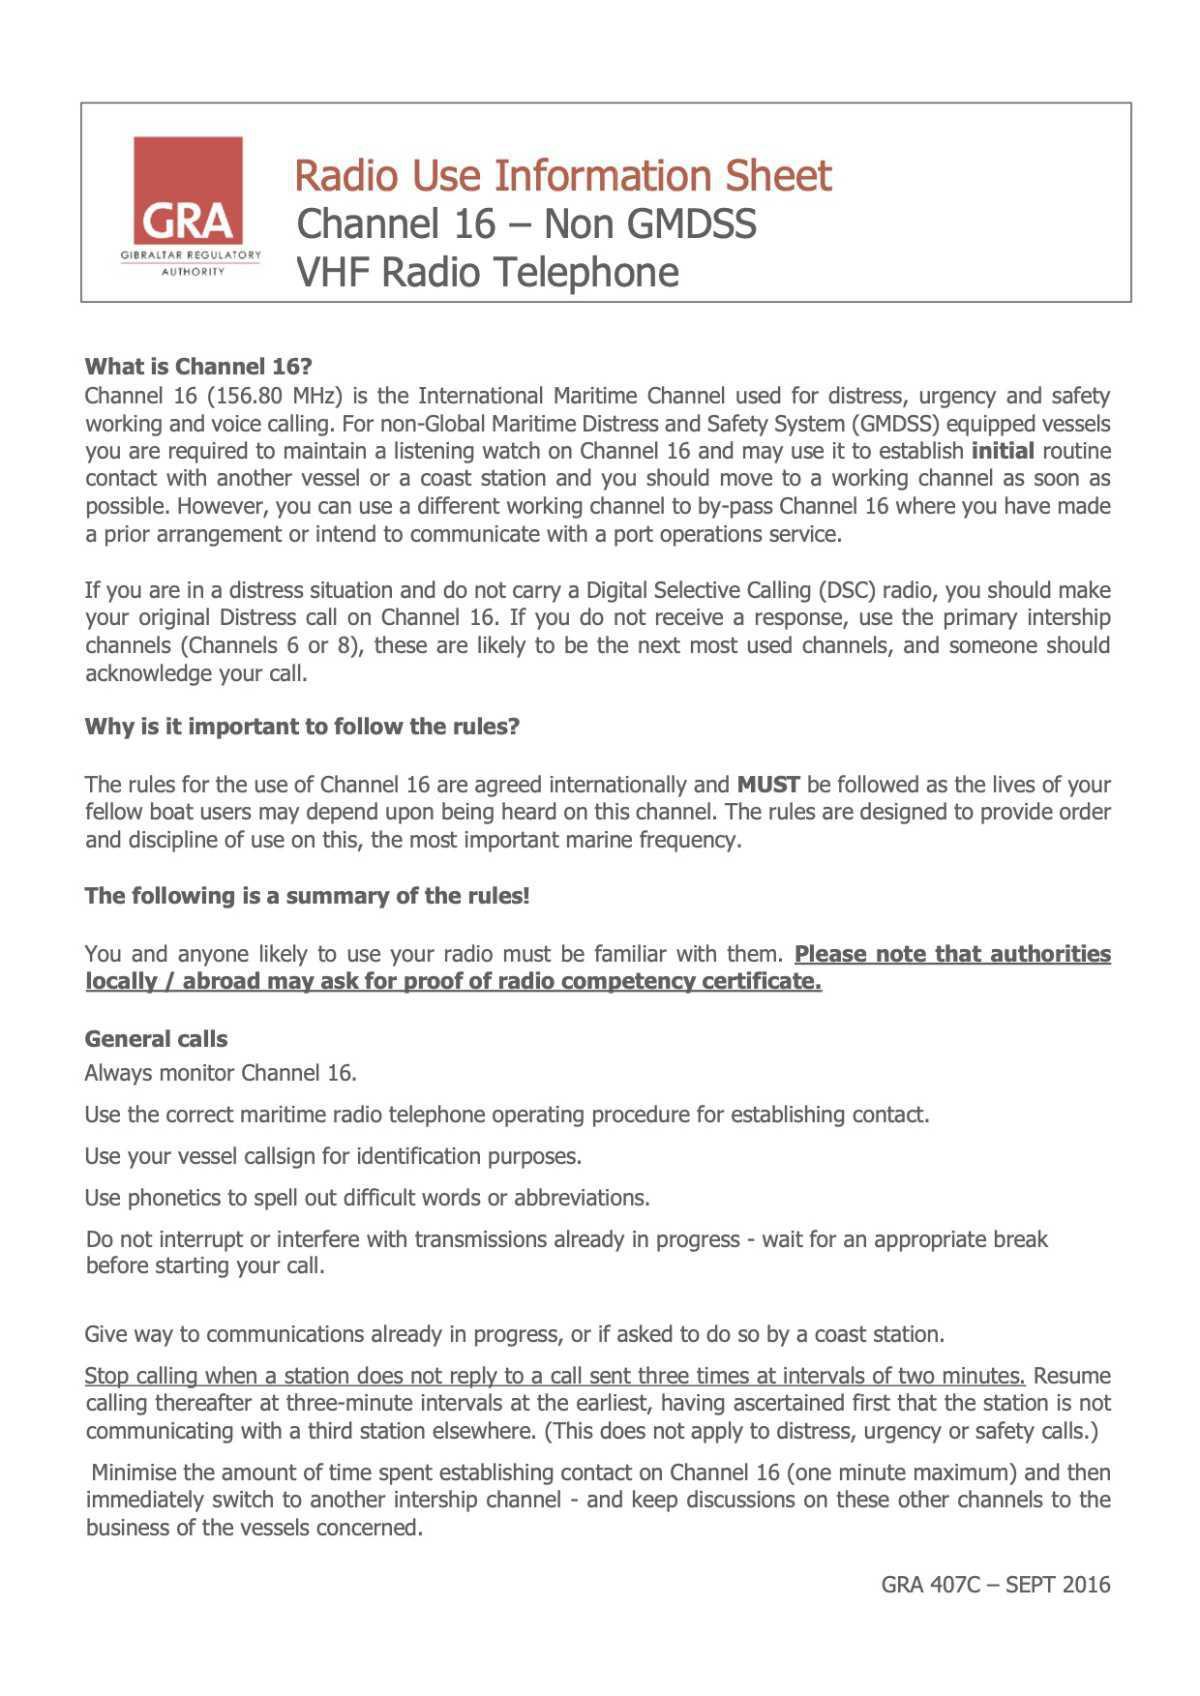 Radio Procedures